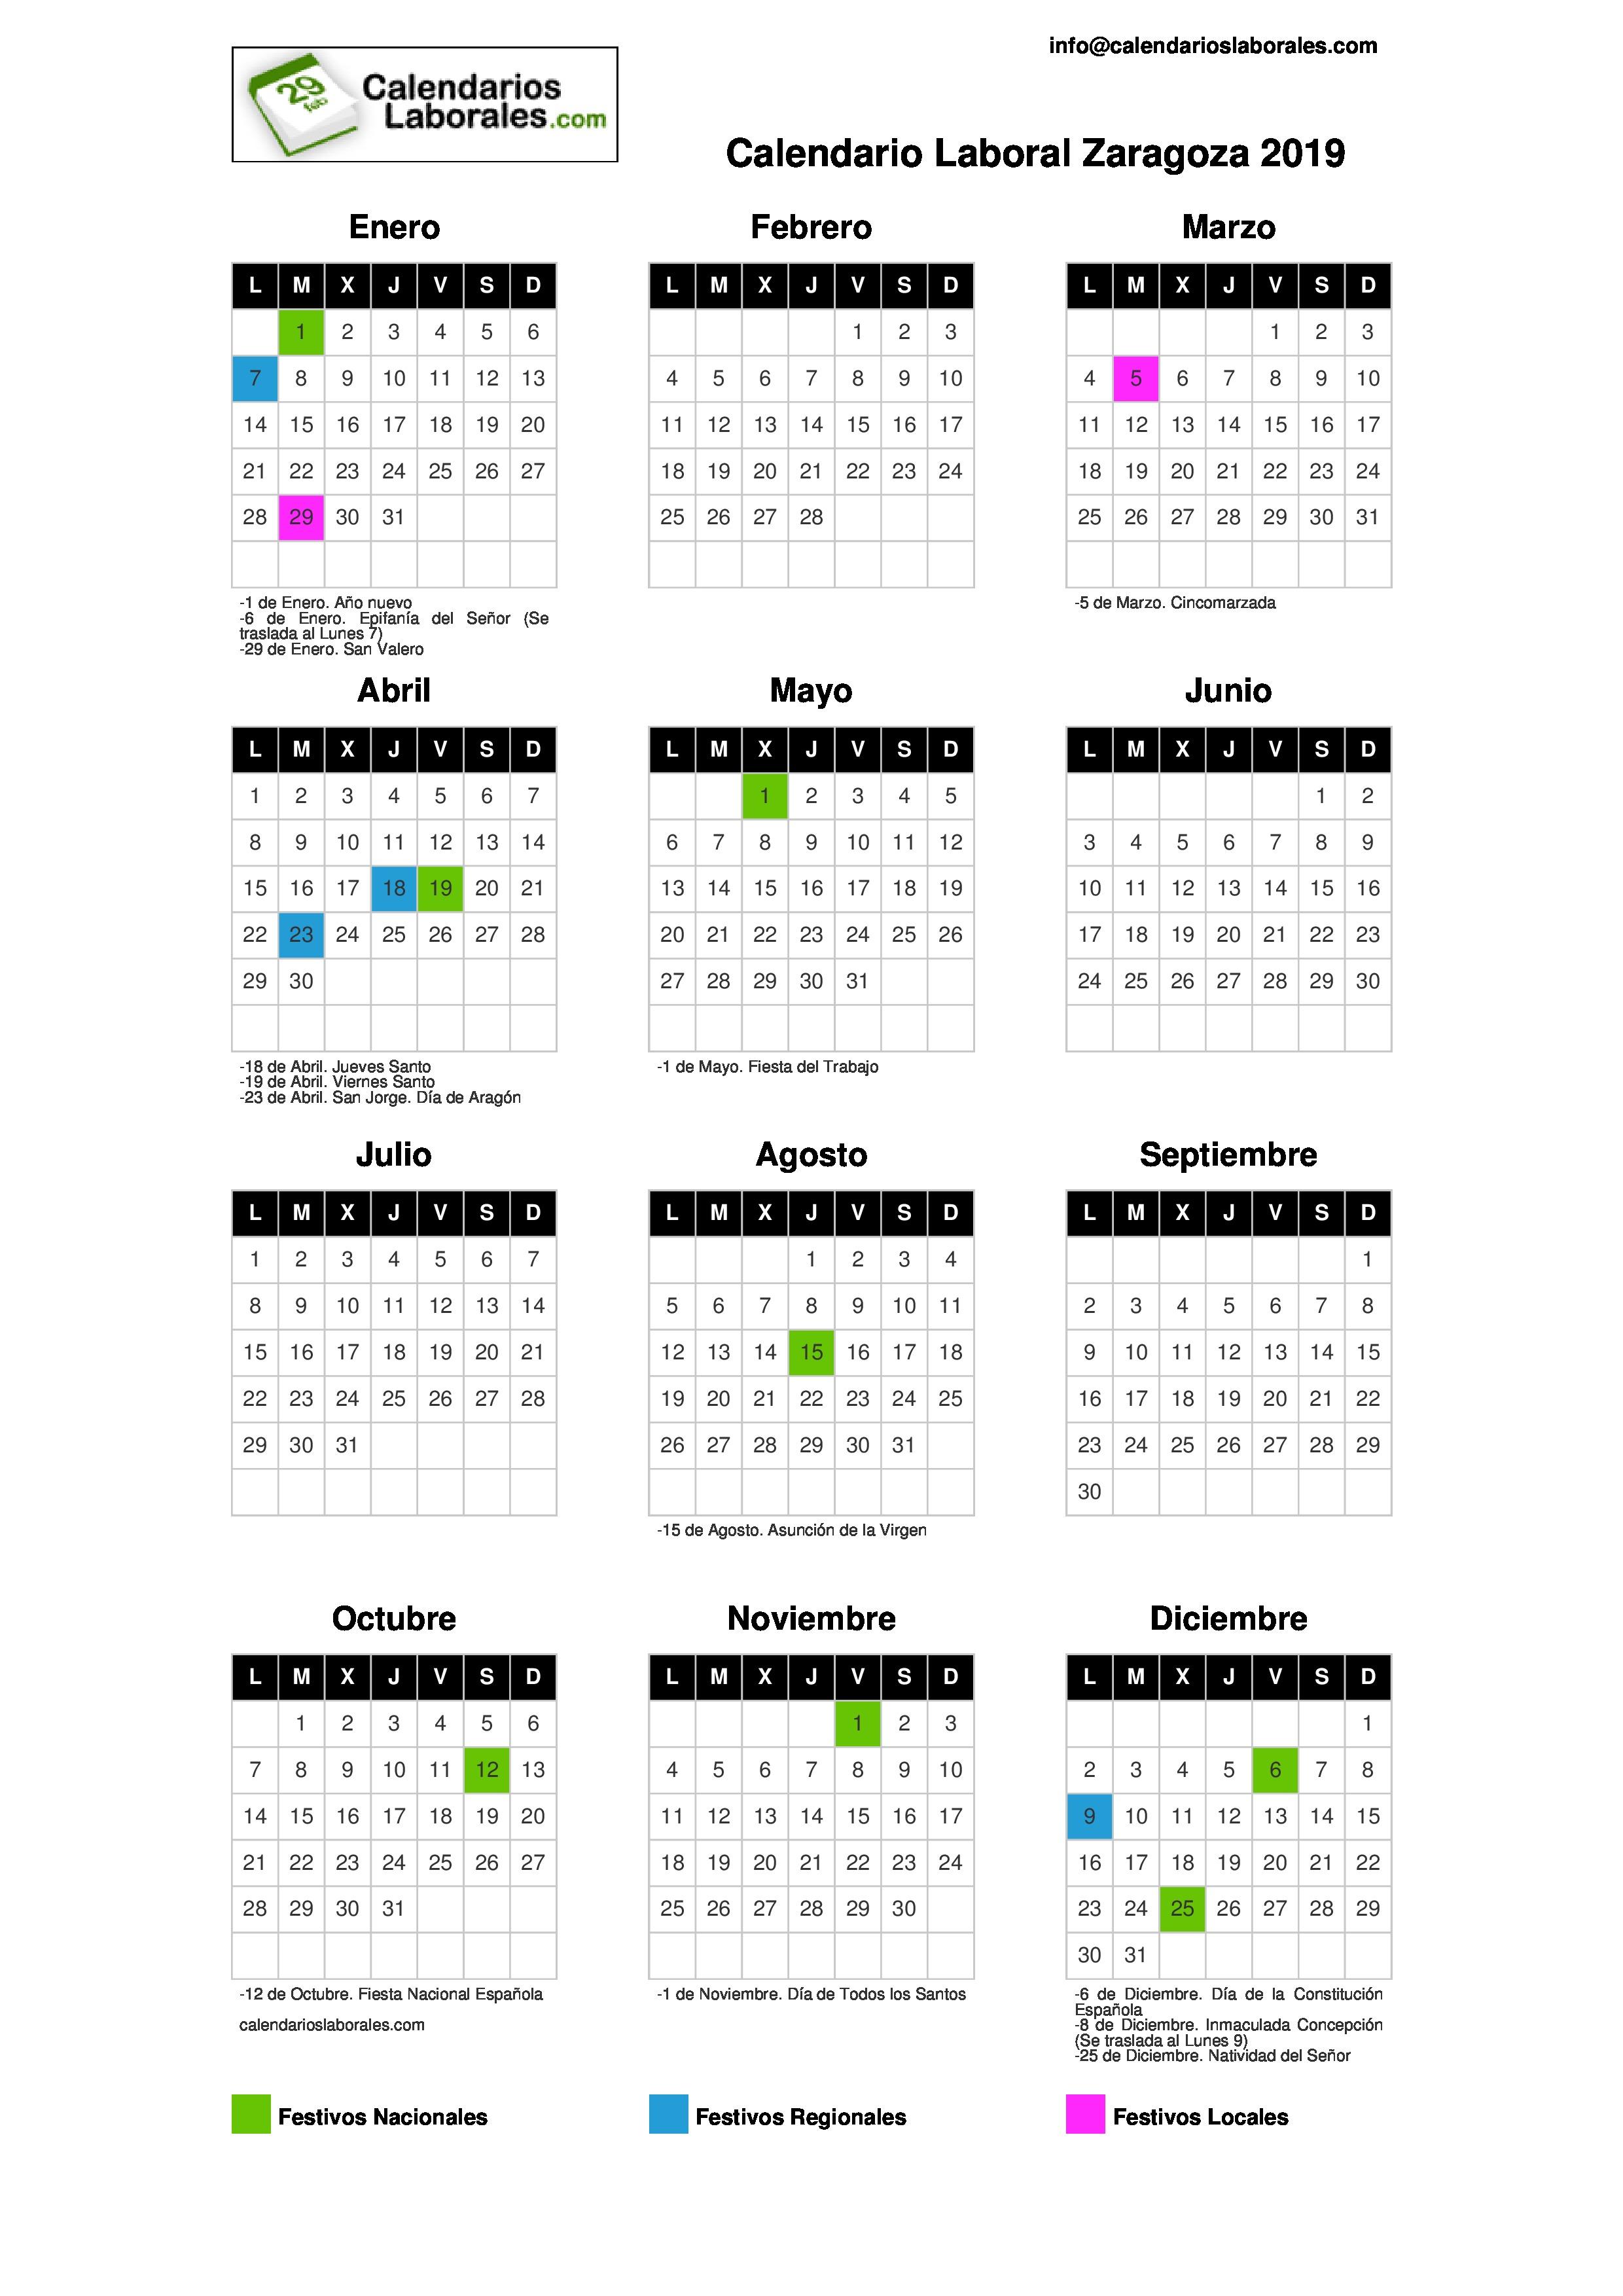 Calendario Laboral 2019 Valencia